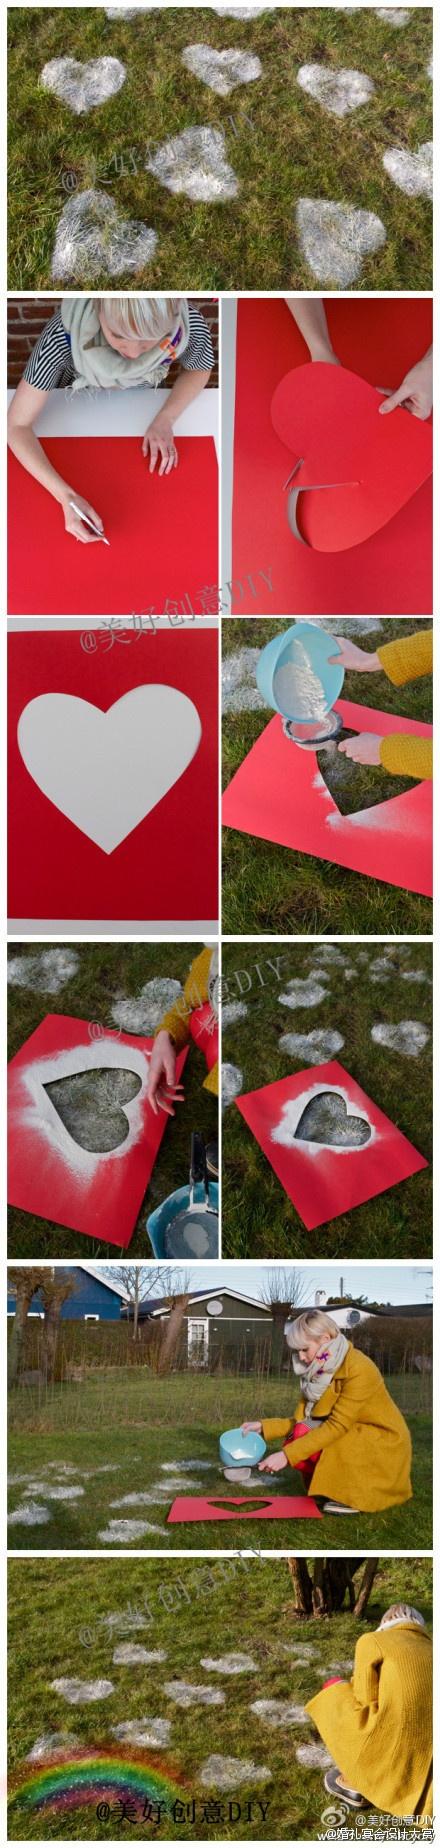 ¡Pisos llenos de amor! ideas creativas para este San Valentin